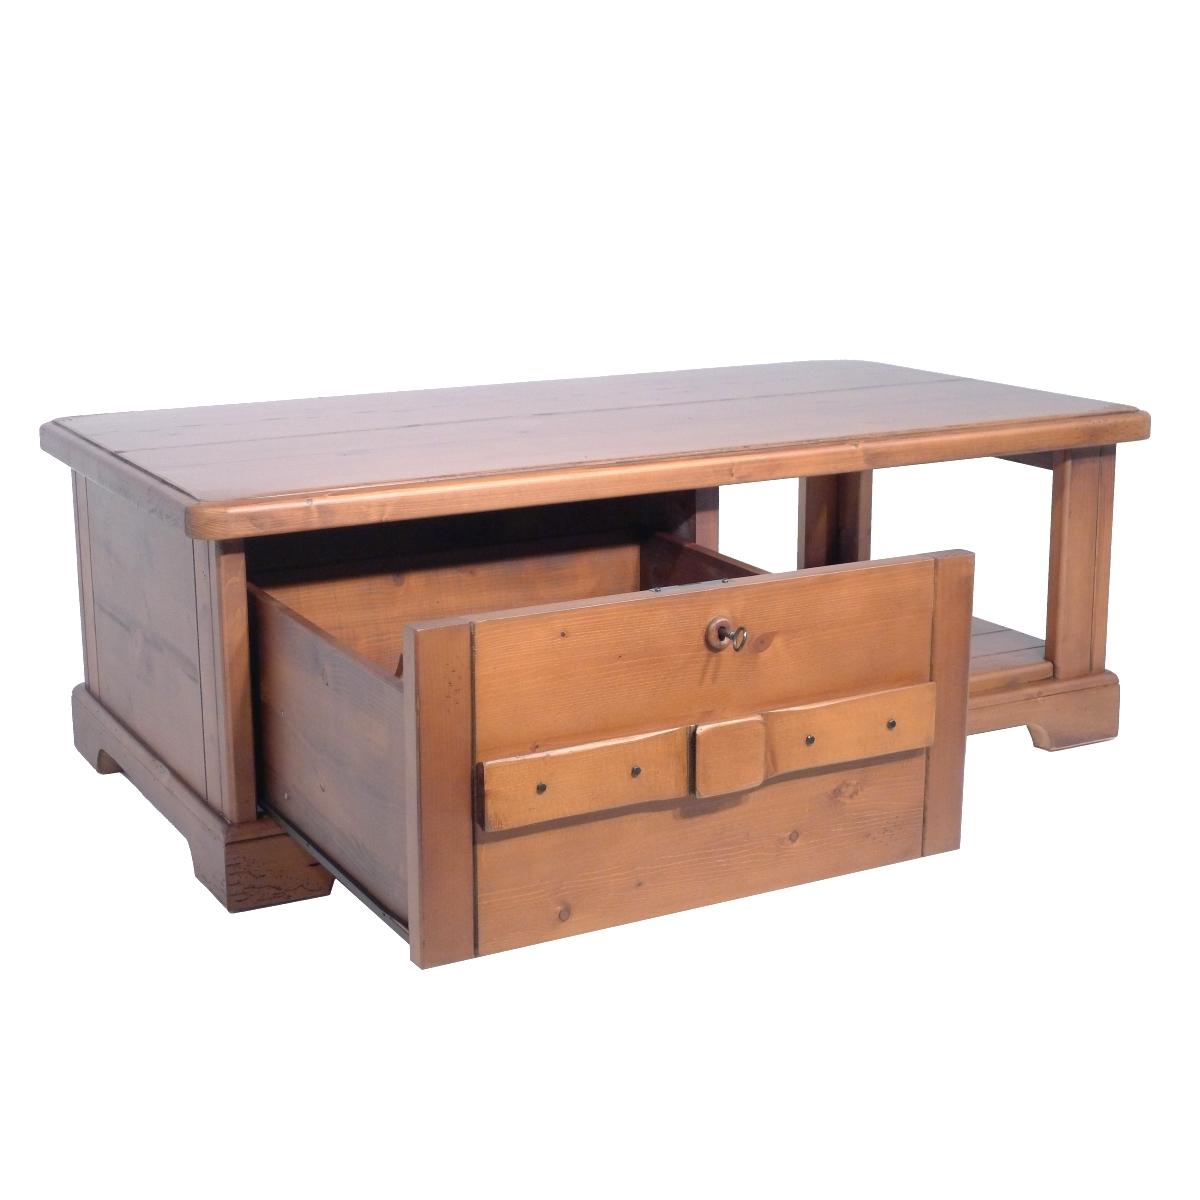 Mesa Centro R Stica Rectangular Caj N Ecor Stico Venta De Muebles # Muebles Sostenibles